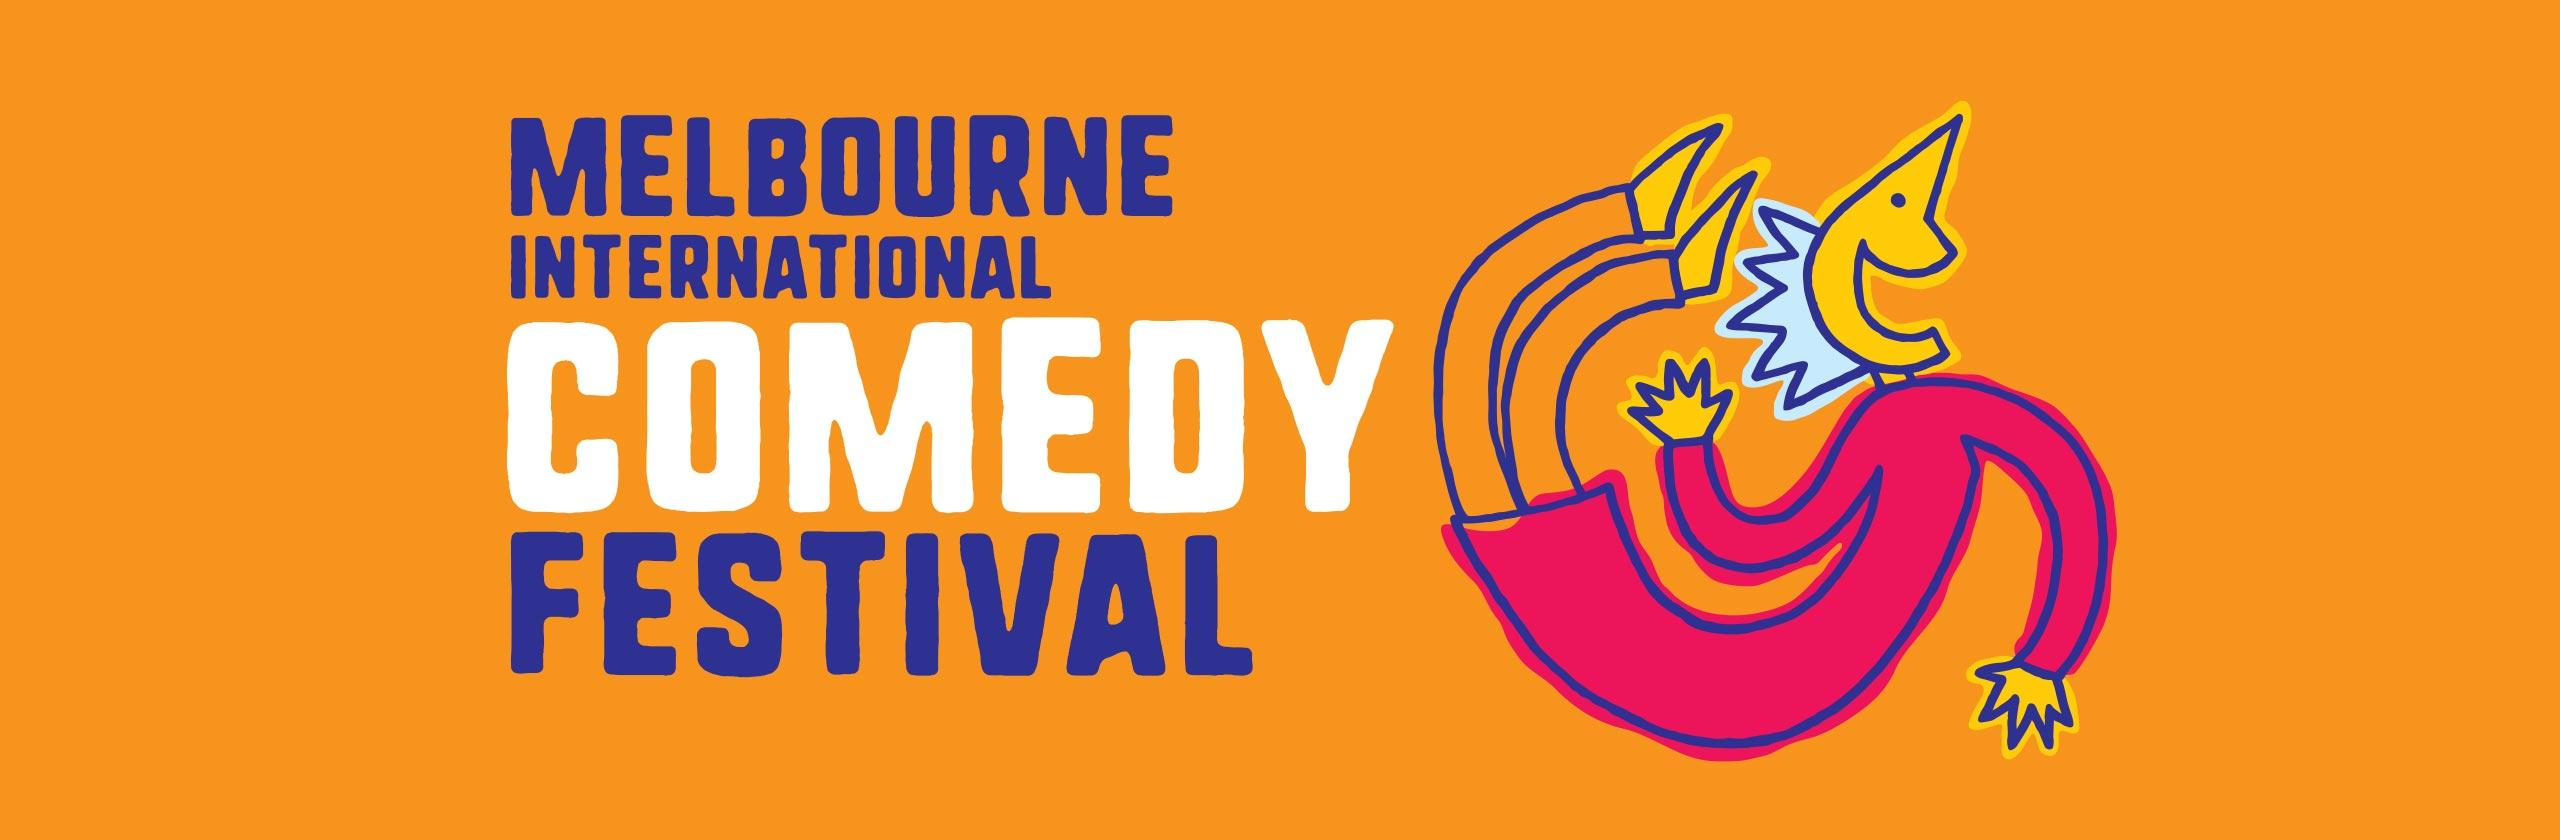 Best Comedy  2021 Melbourne International Comedy Festival 2021 | A List Entertainment